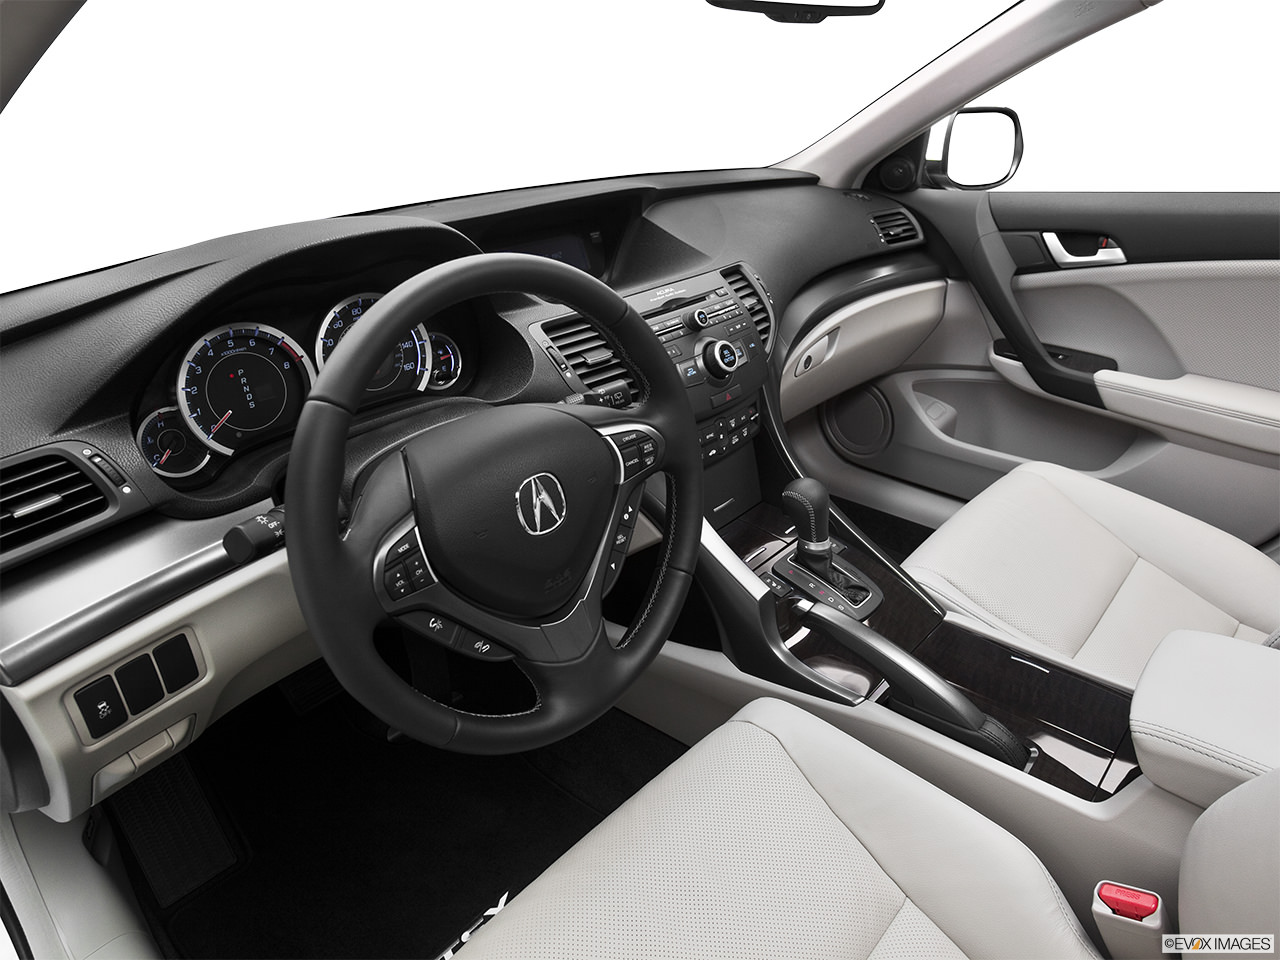 Acura TSX 2012 Interior